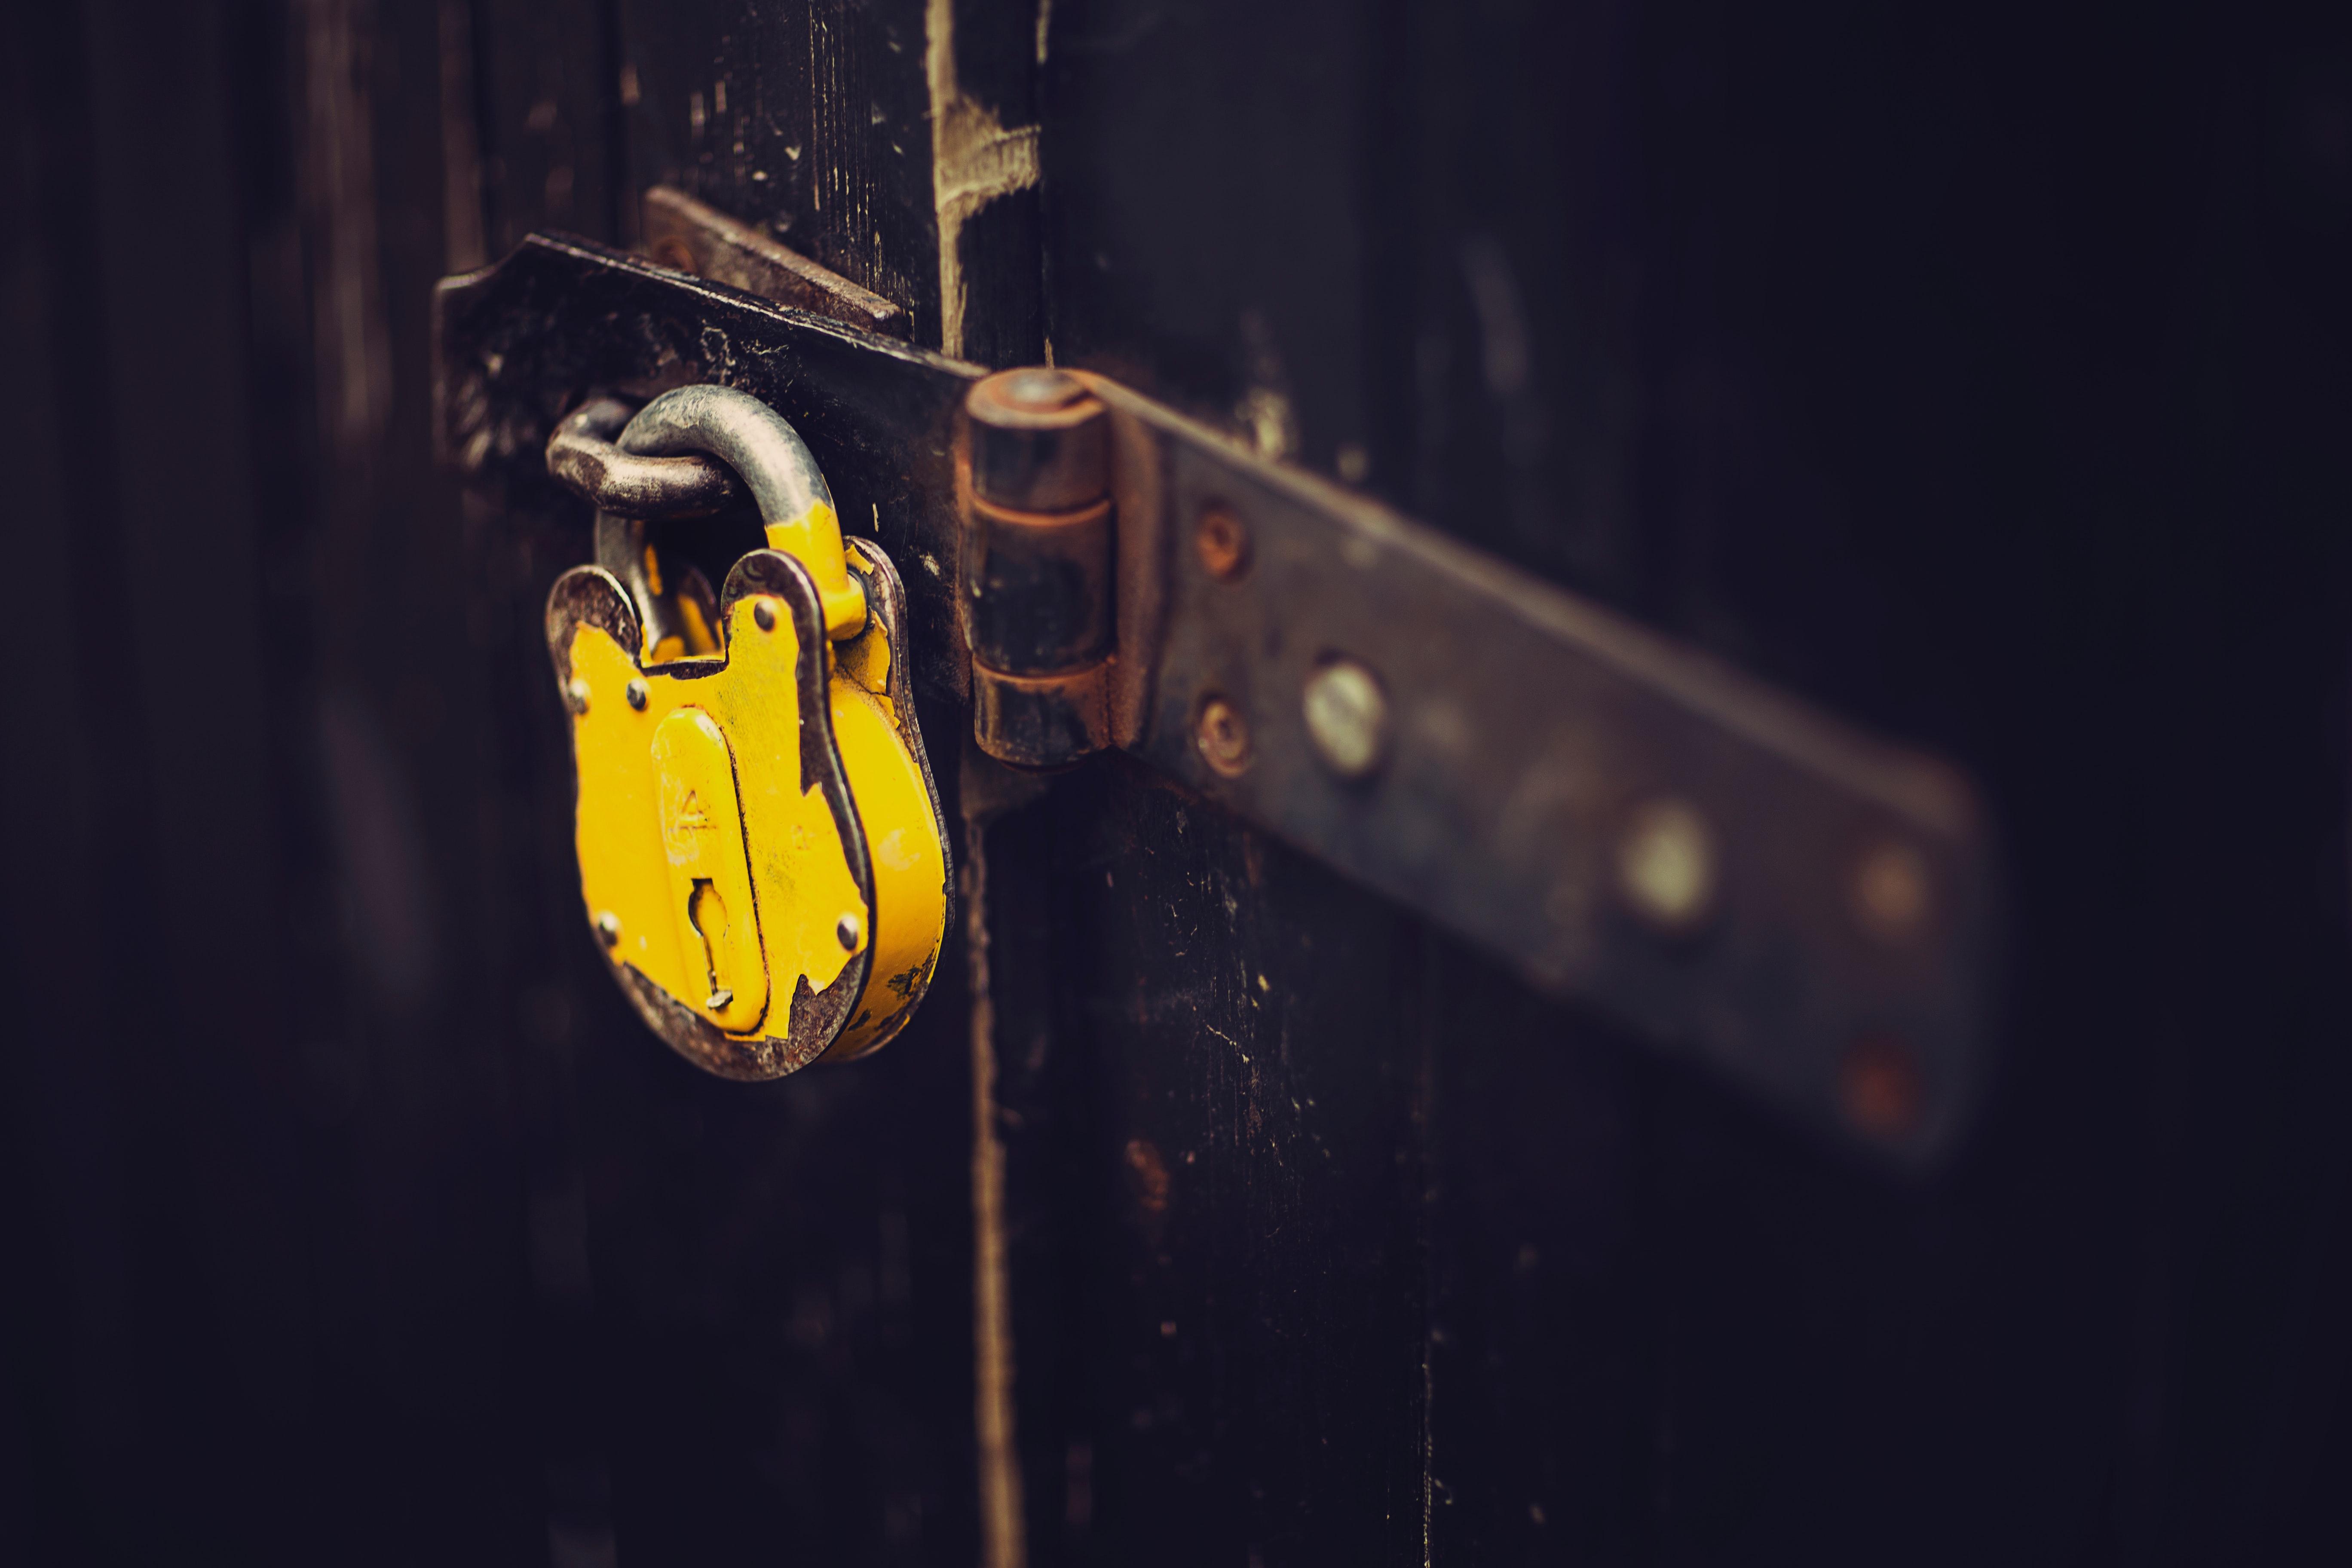 padlock-yellow